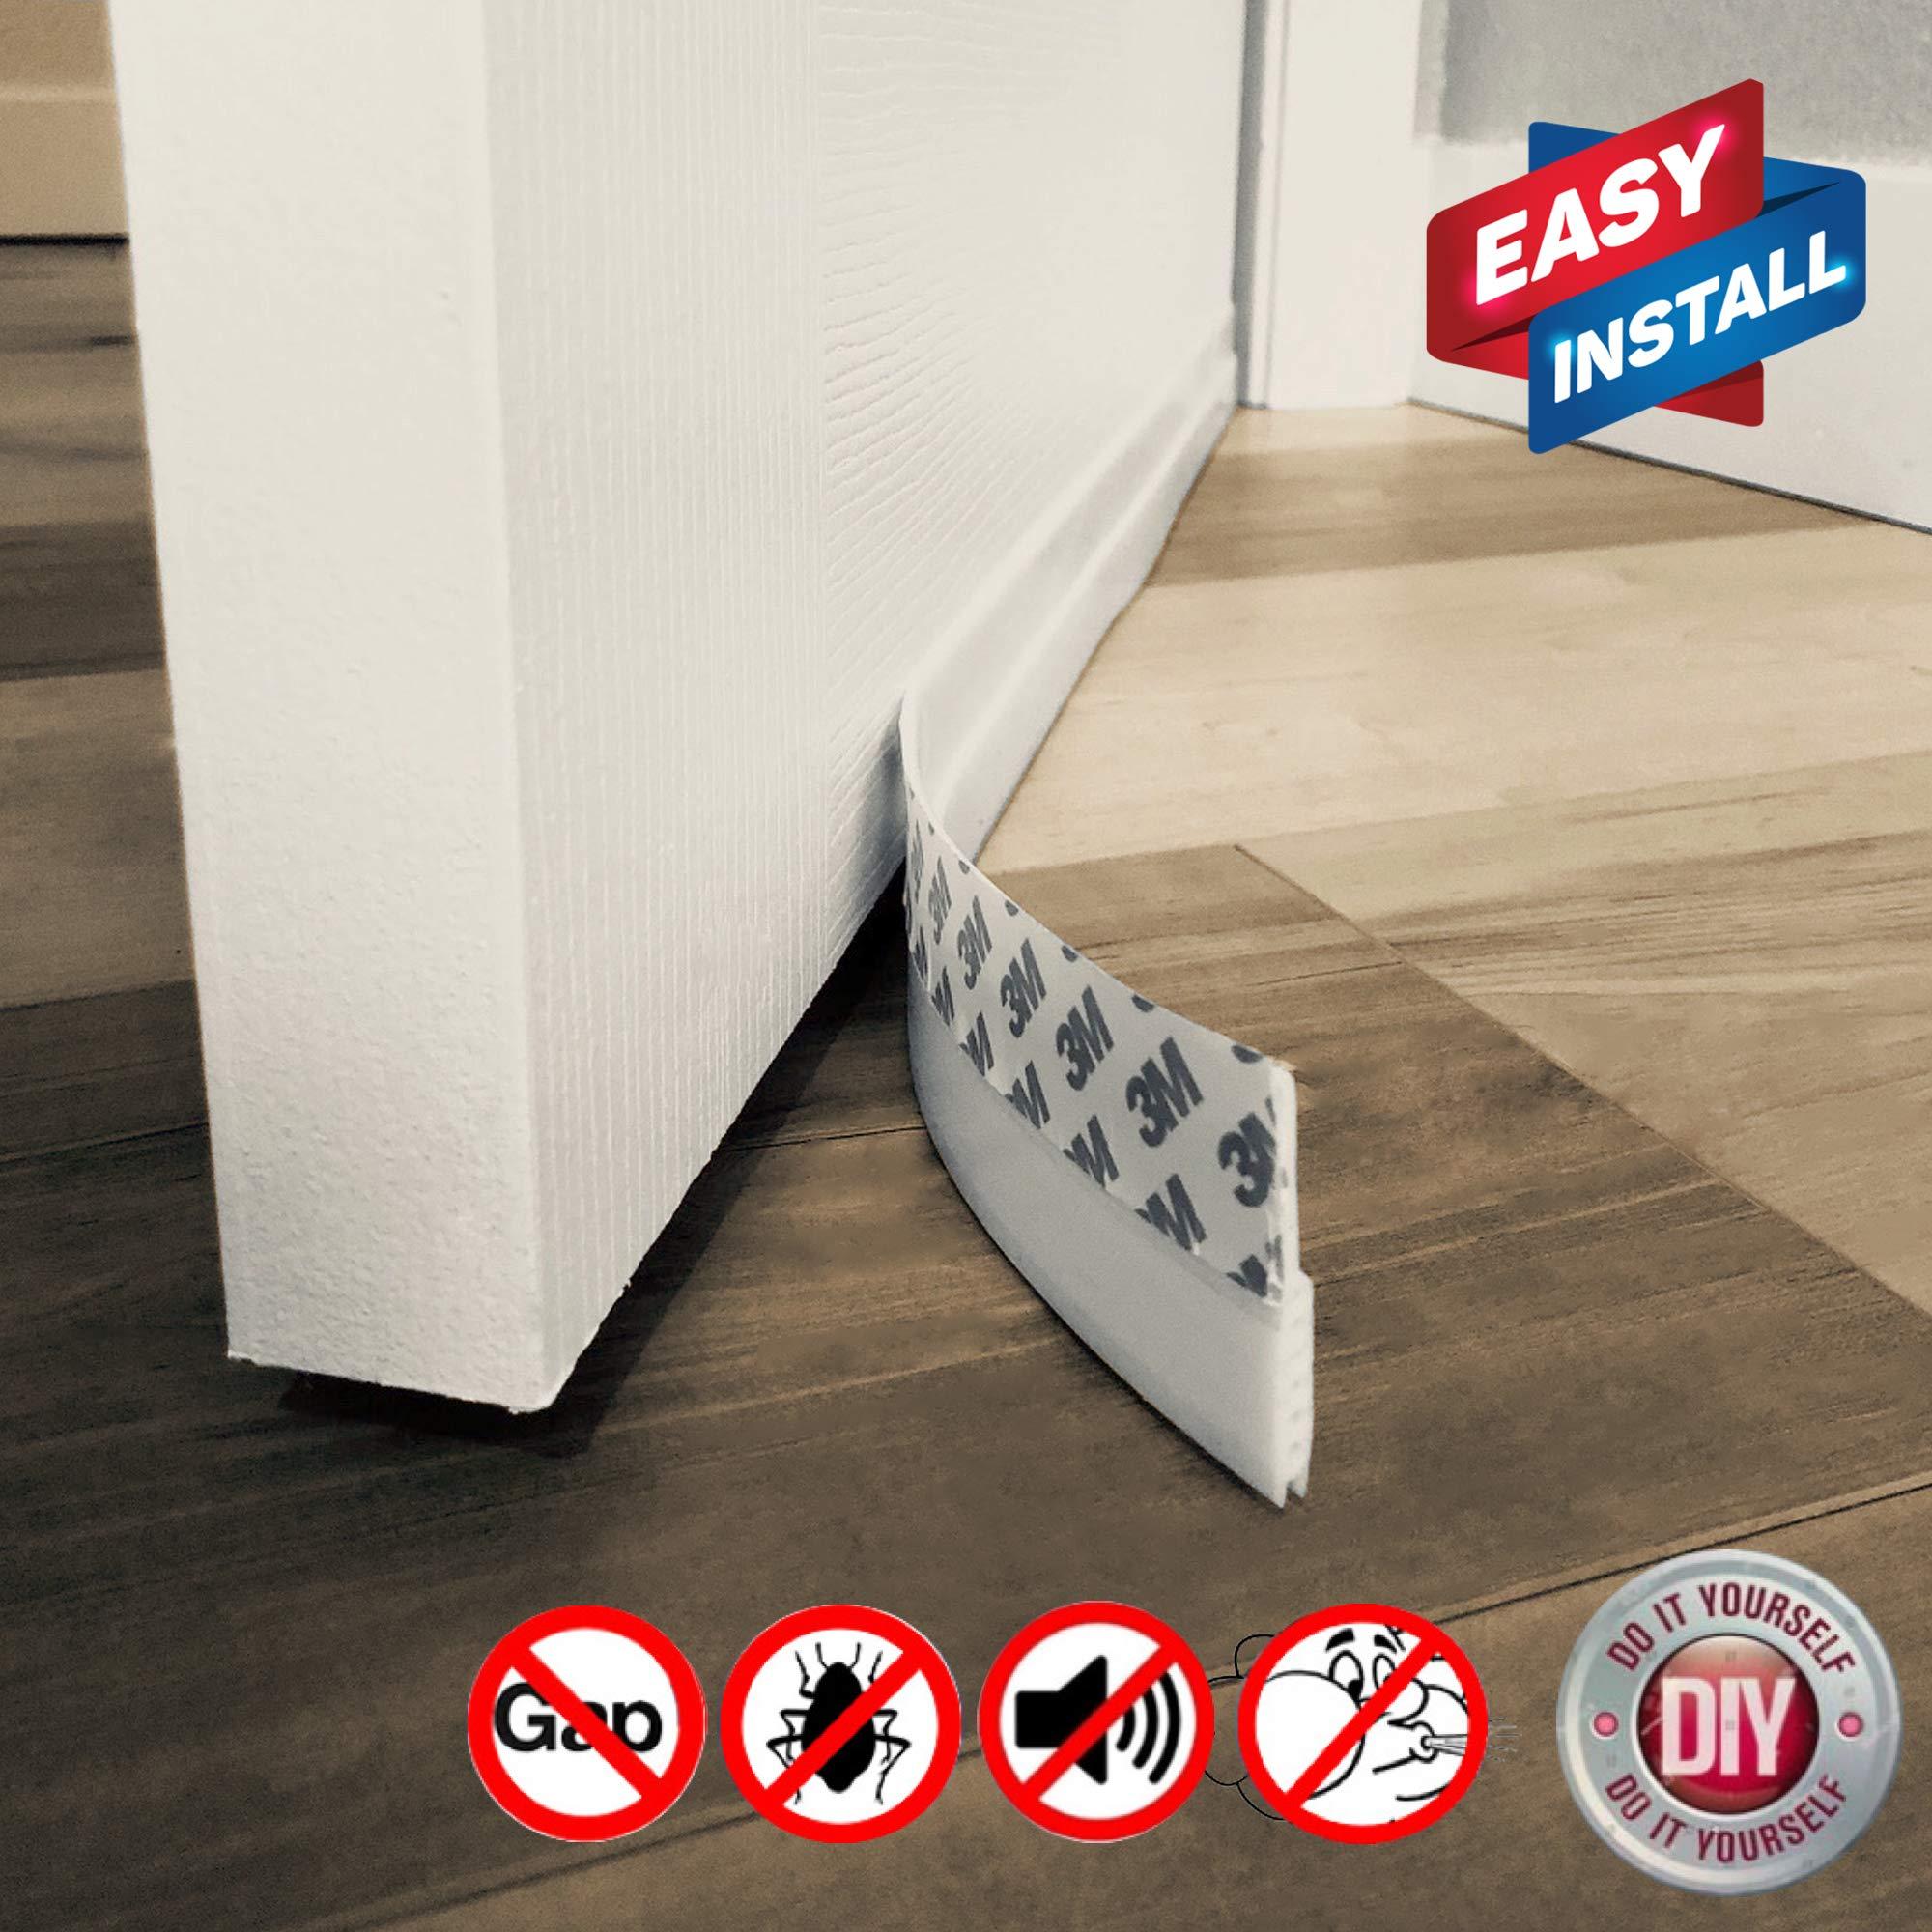 Door Draft Stopper – High Performance Silicone Door Sweep w VHB Adhesive 3M Strip | Draft Blocker for Under Door Seal Gap Interior & Exterior Doors Weather Stripping Soundproof | Draft Guard Insulator